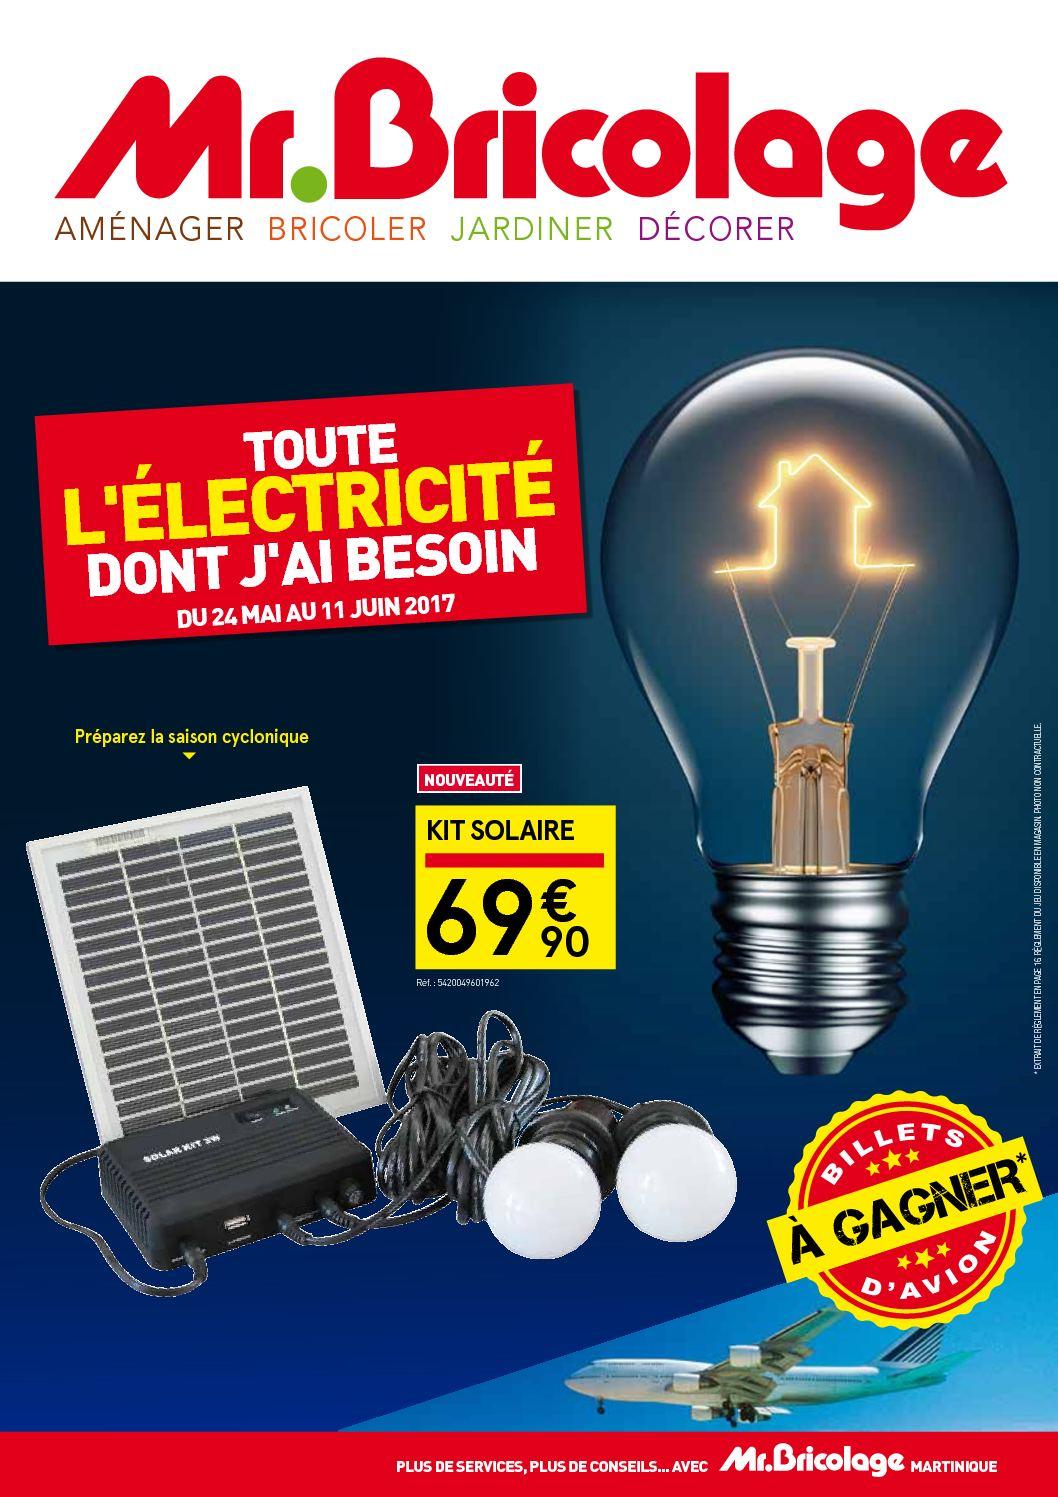 Catalogue Toute L'Electricite 24mai 11juin2017